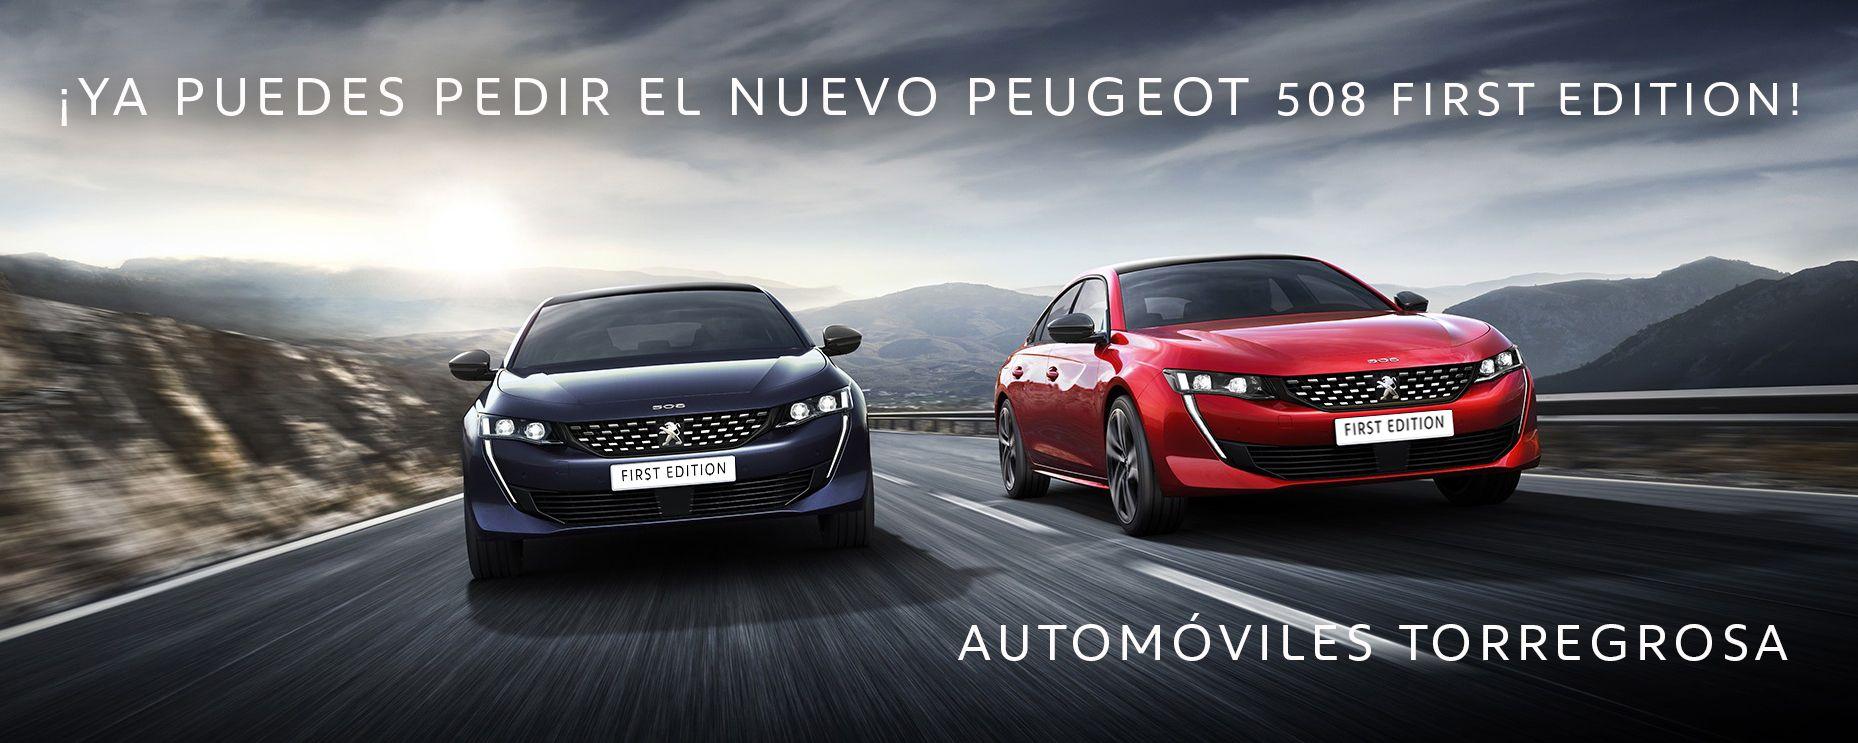 La serie limitada Peugeot 508 First Edition está disponible por 47.200 €(SOLO 120 UNIDADES PARA 12 PAISES).